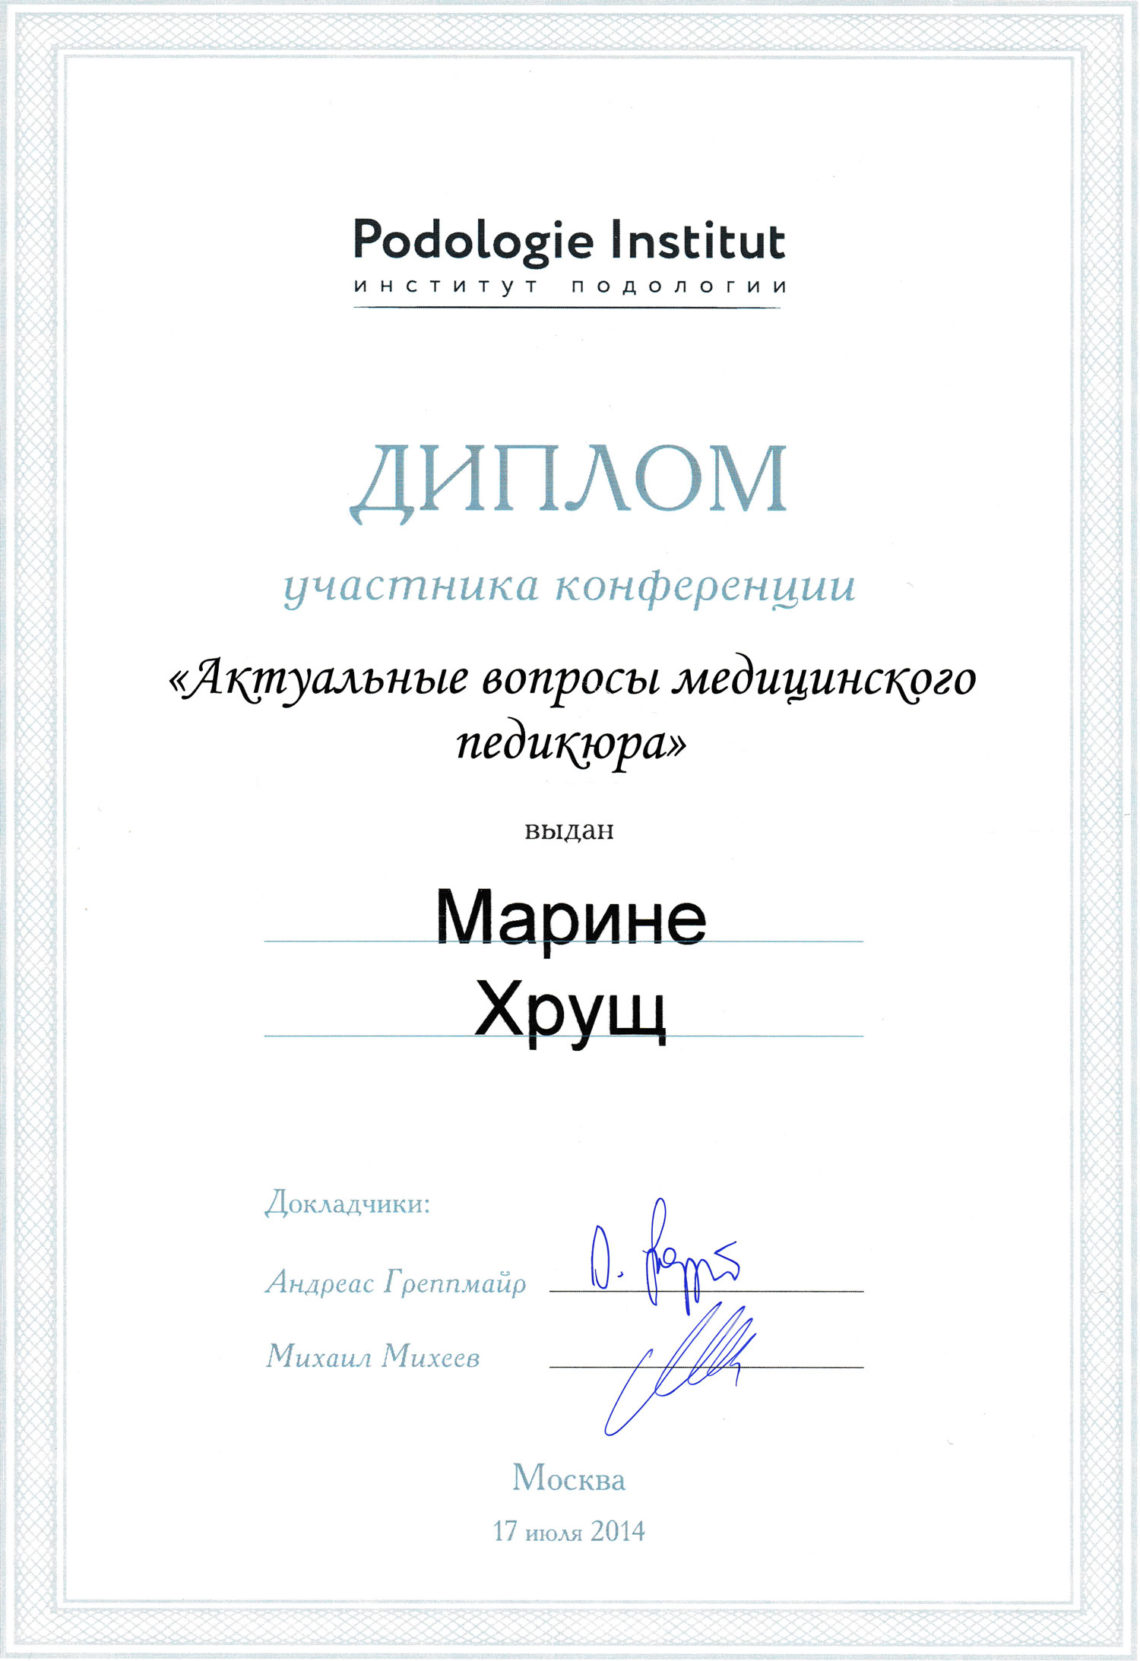 Podoinstitut клиника подологии сертификат подолог хрущ марина васильевна